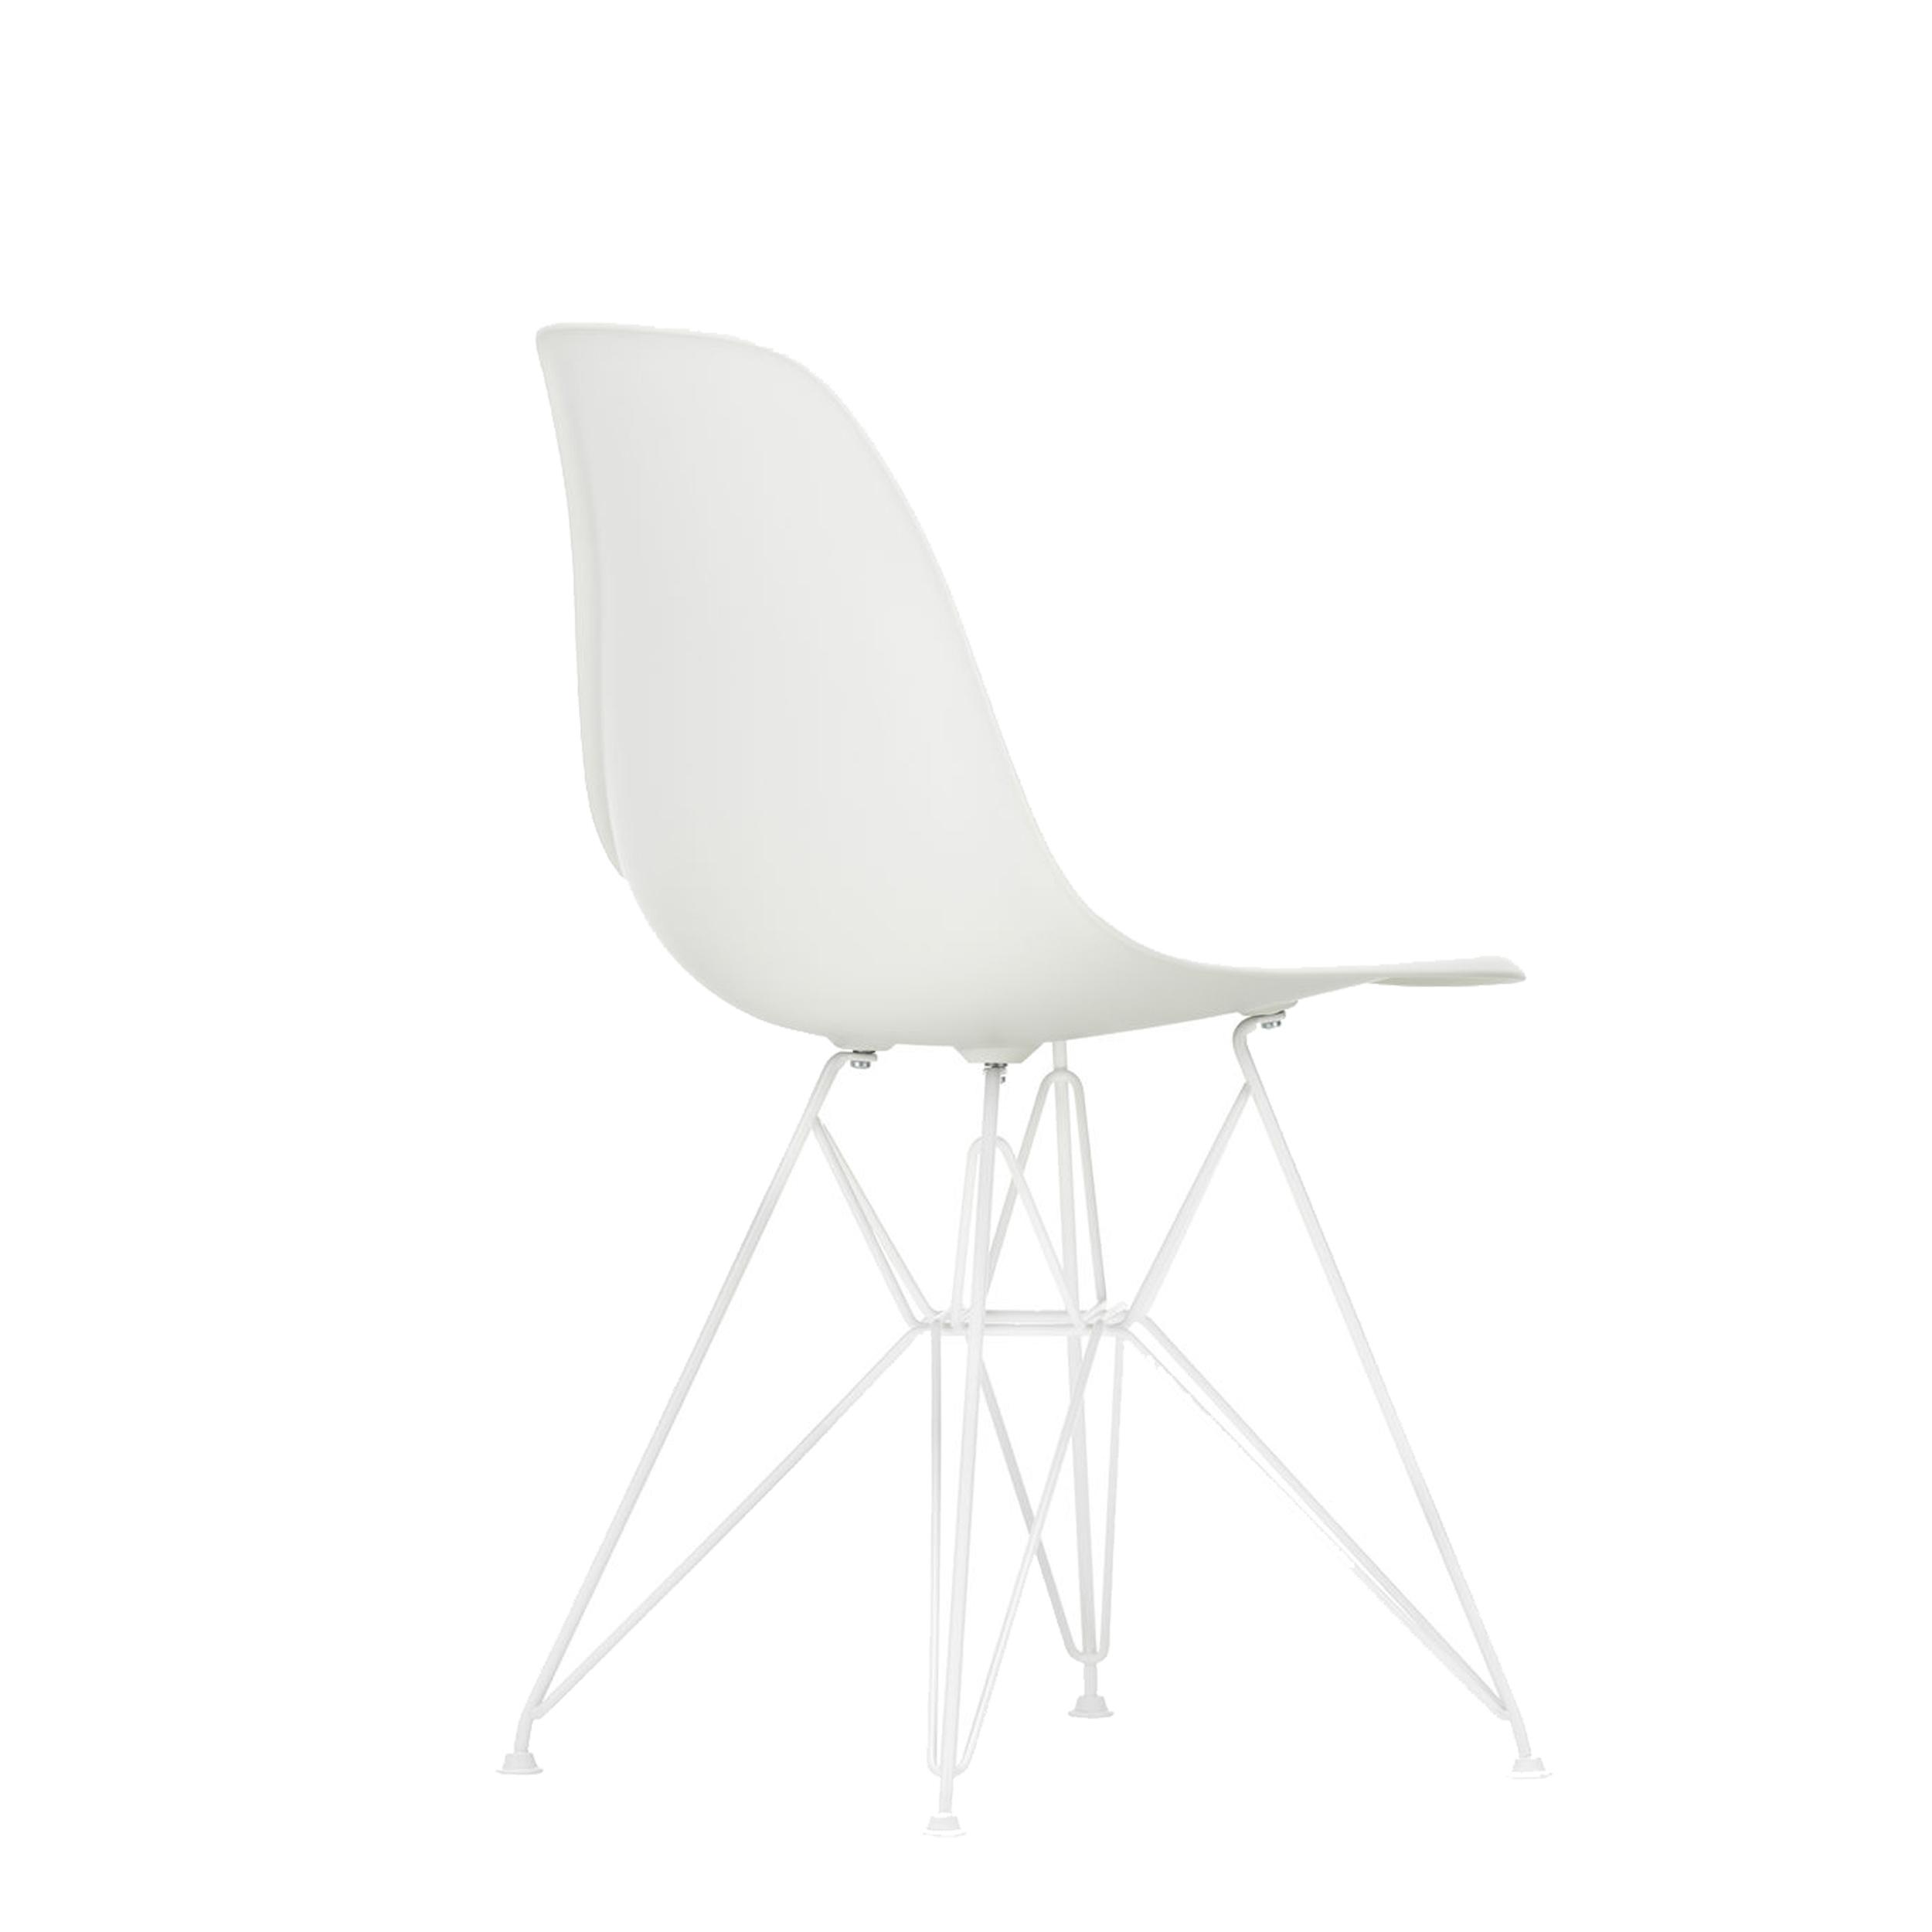 Vitra Eames Plastic Side Chair Dsr Charles Und Ray Eames Designikonen Designmobel Shop